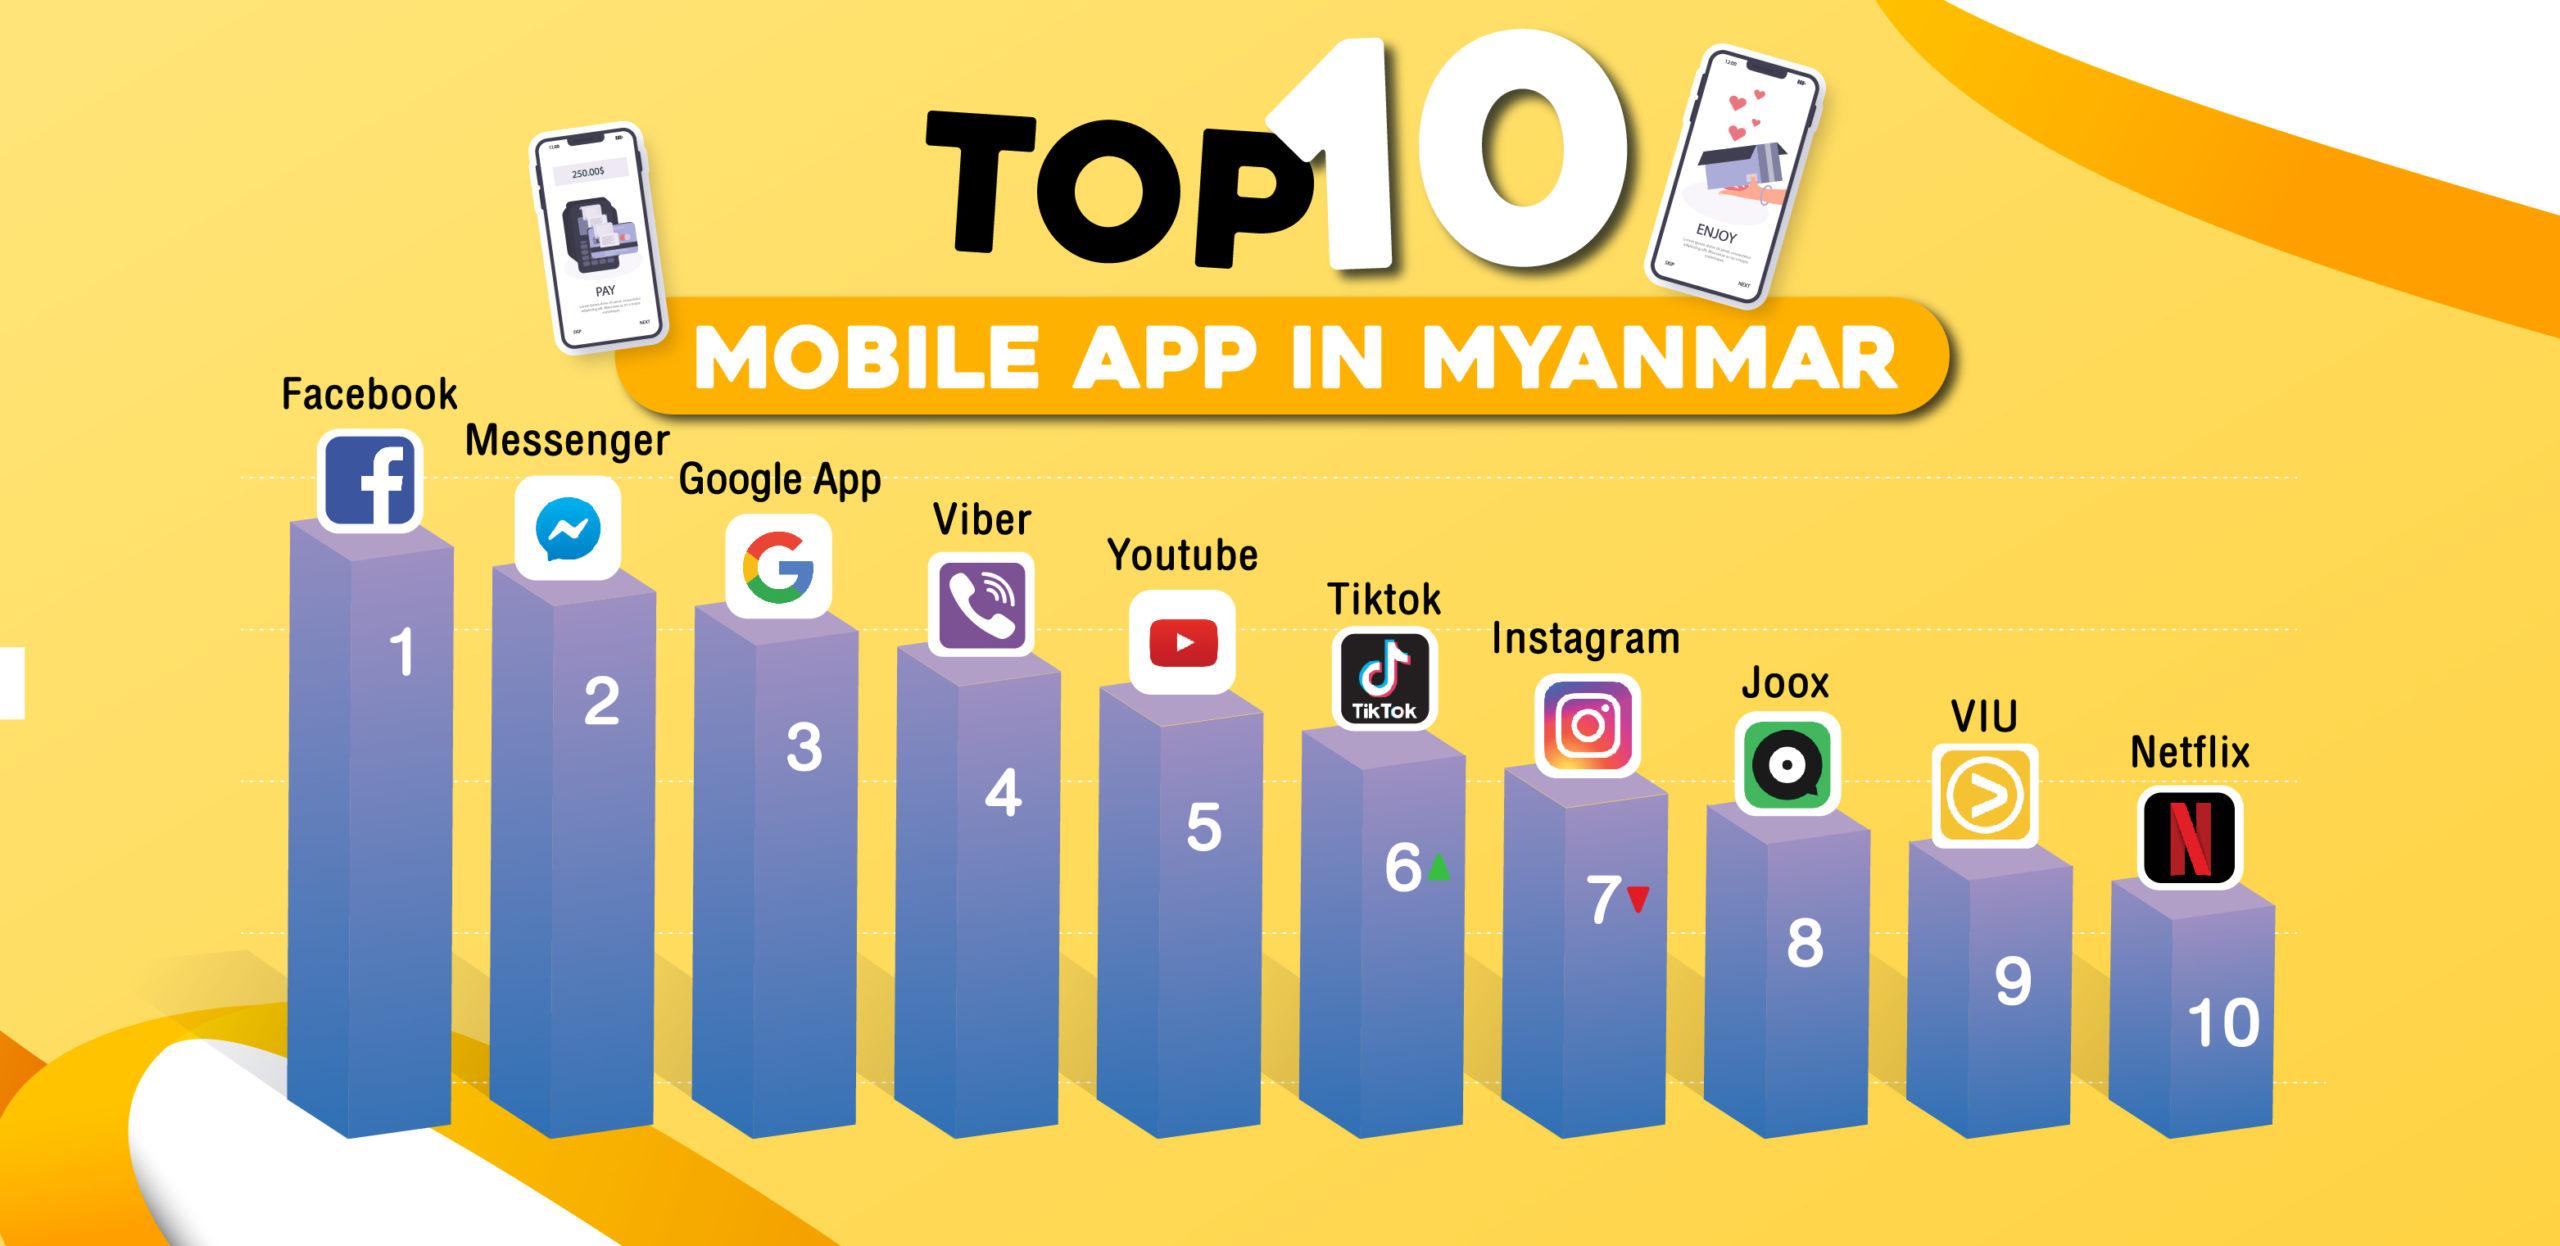 Top10 Mobile App In Myanmar